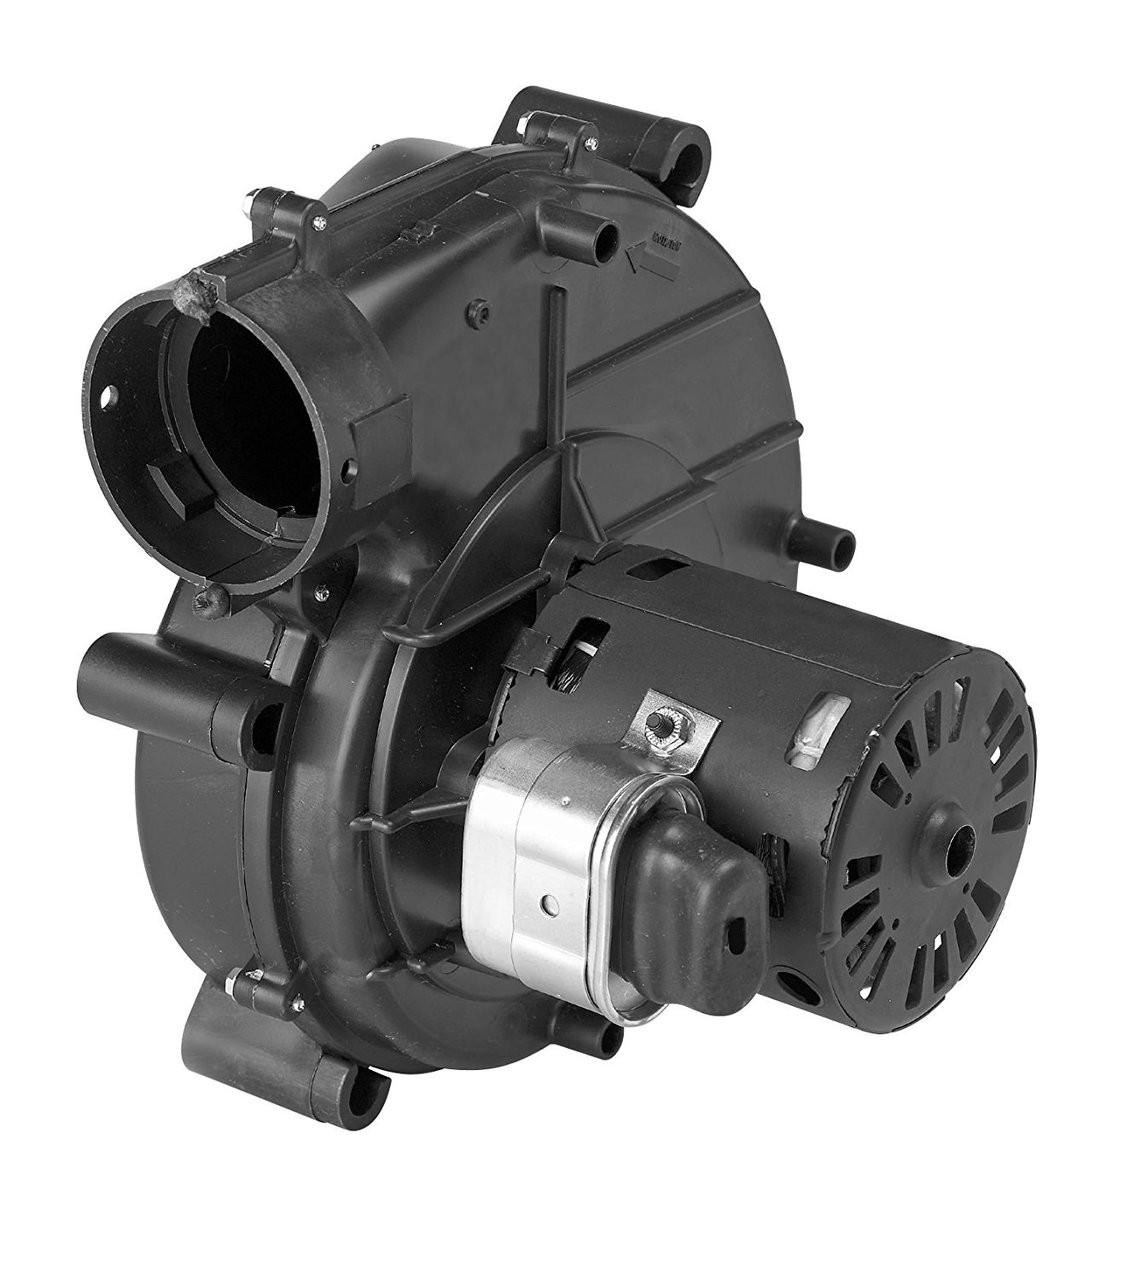 hight resolution of york ducane furnace draft inducer 7062 5019 7062 3136 115v fasco a168